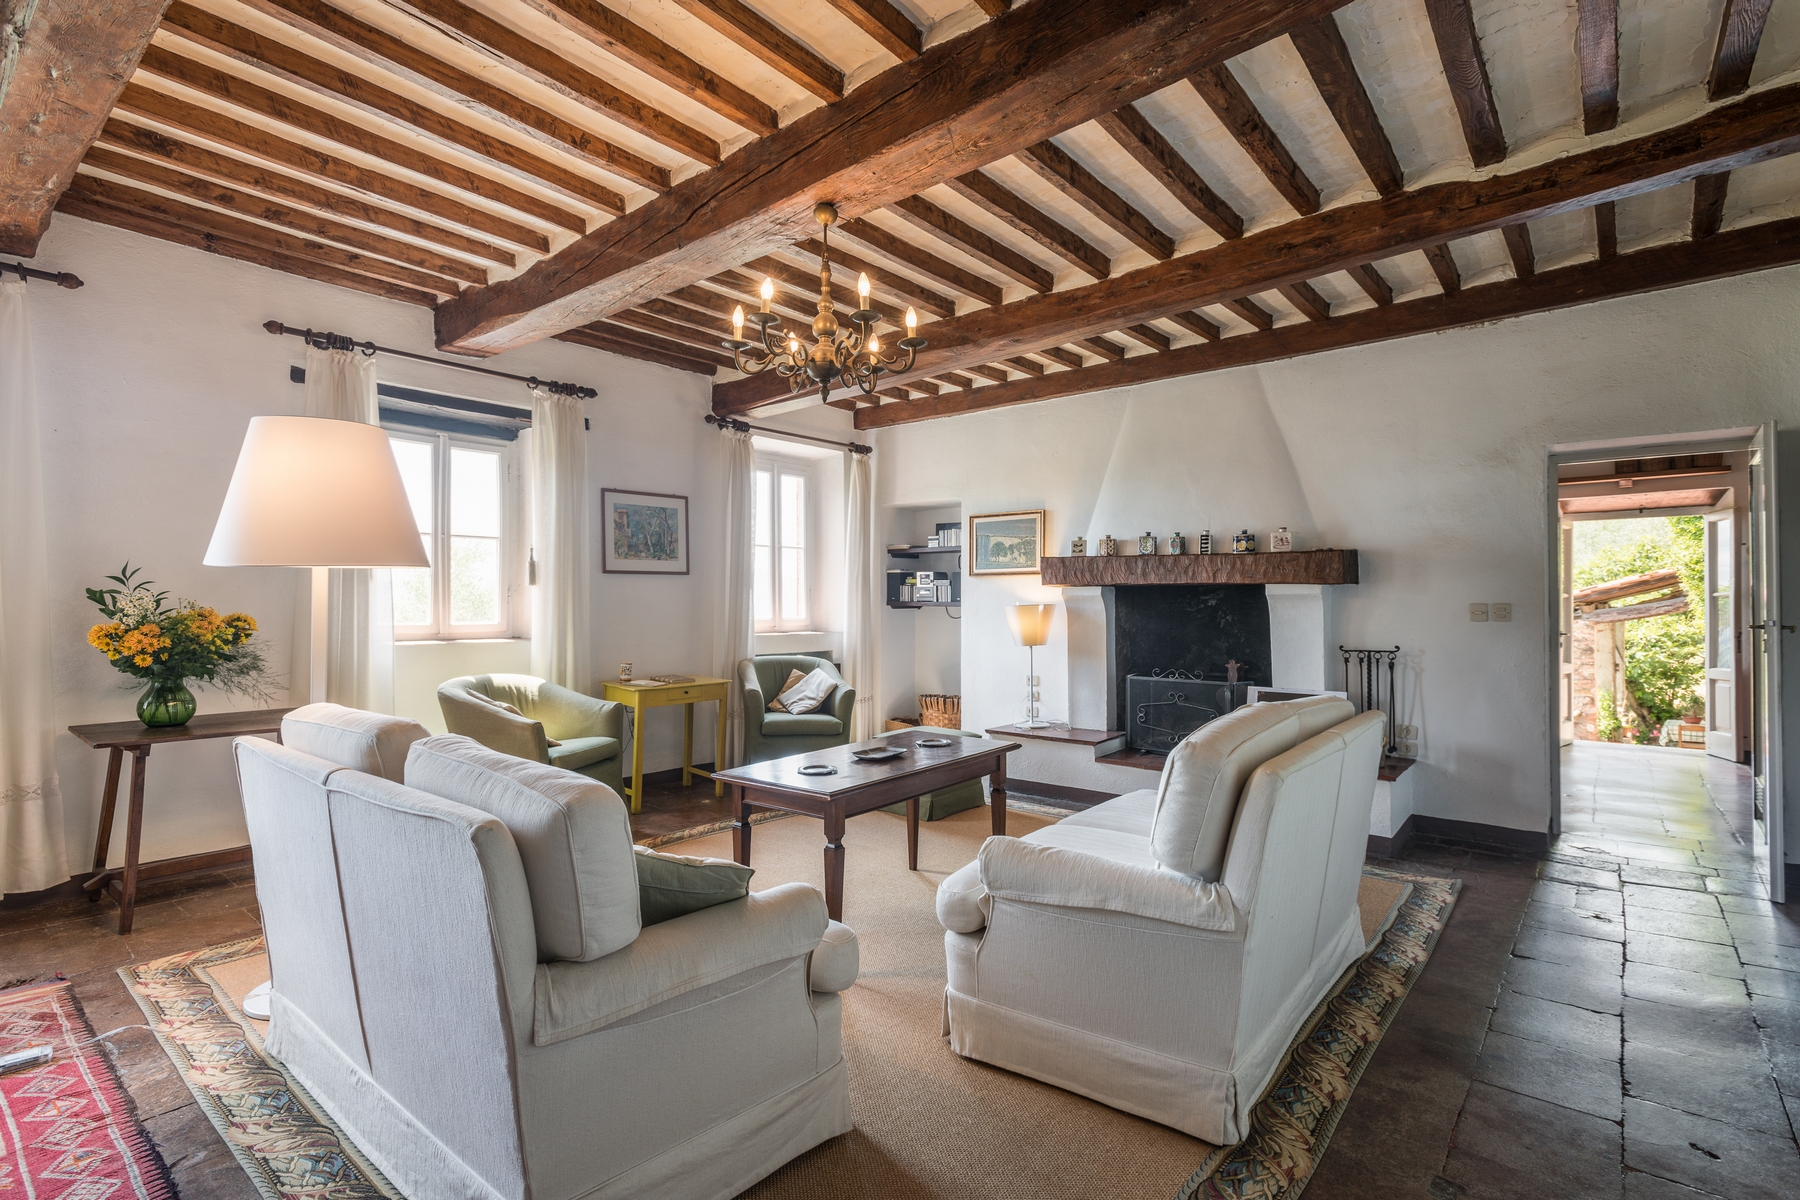 Villa in Vendita a Lucca: 5 locali, 550 mq - Foto 6